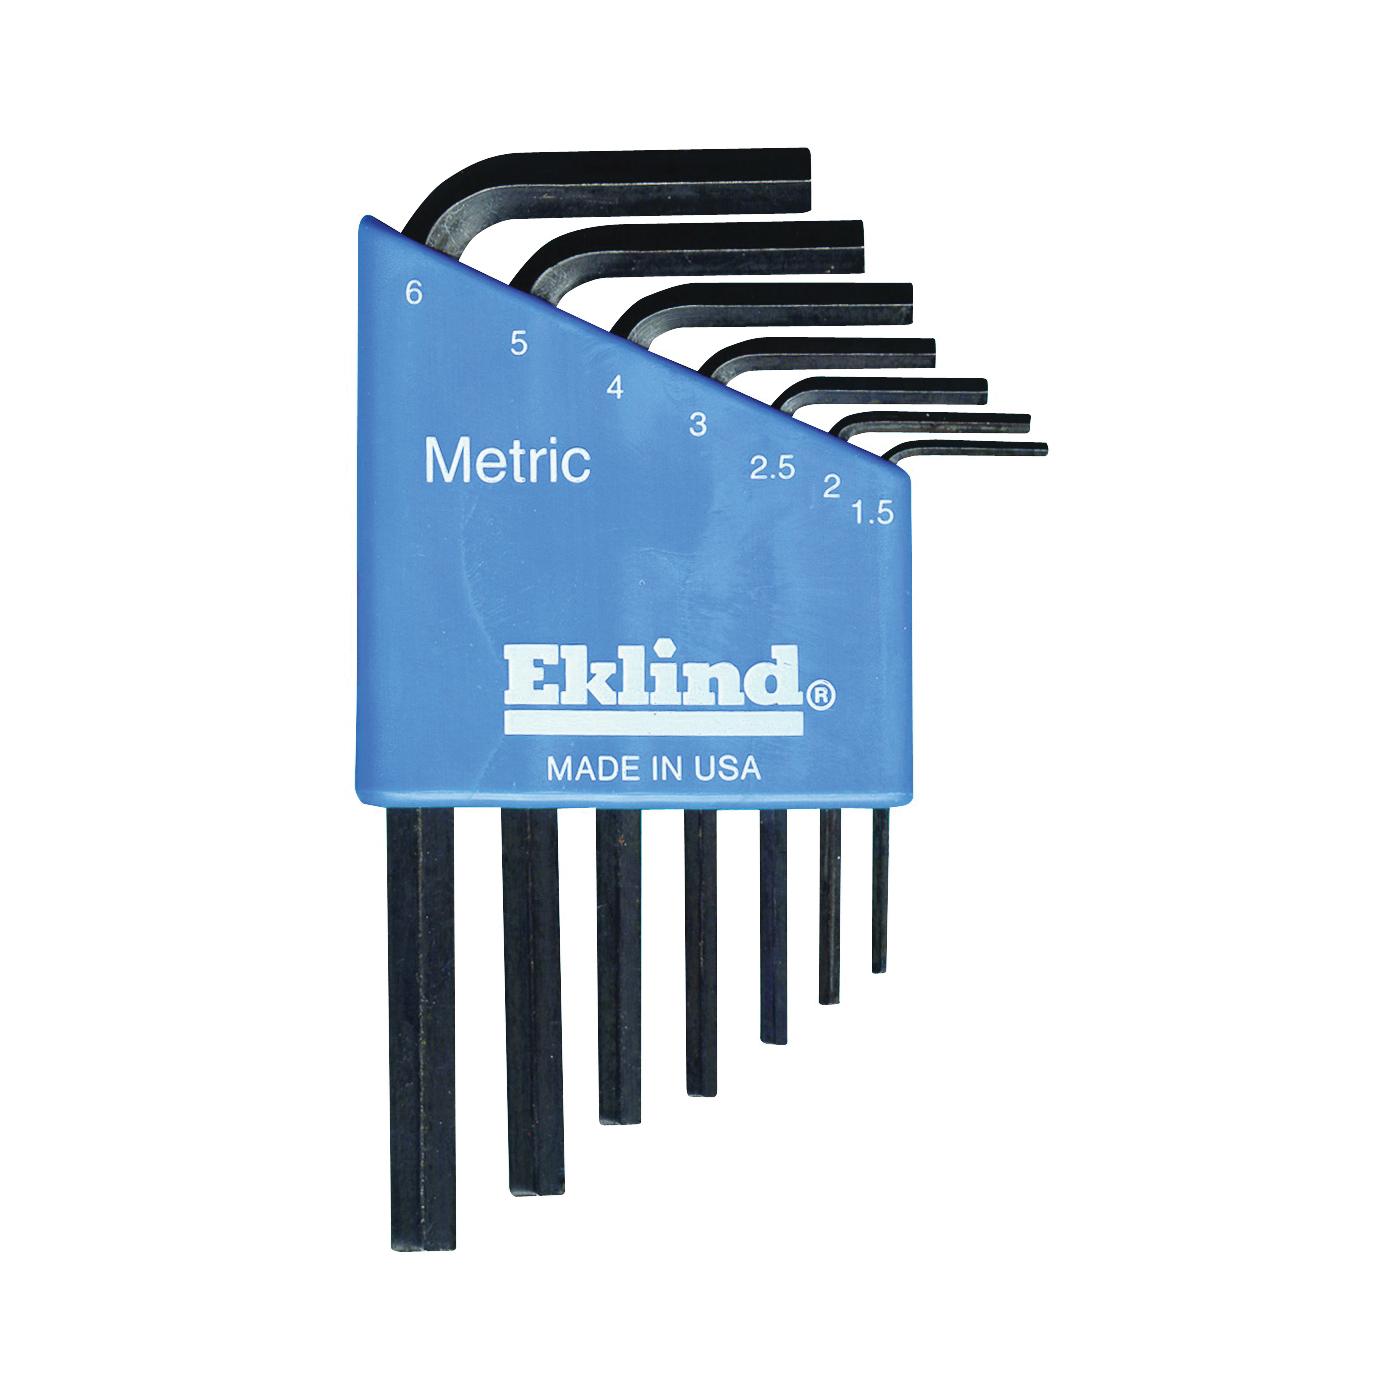 Picture of Eklind 10507 Hex Key Set, 7 -Piece, Steel, Black